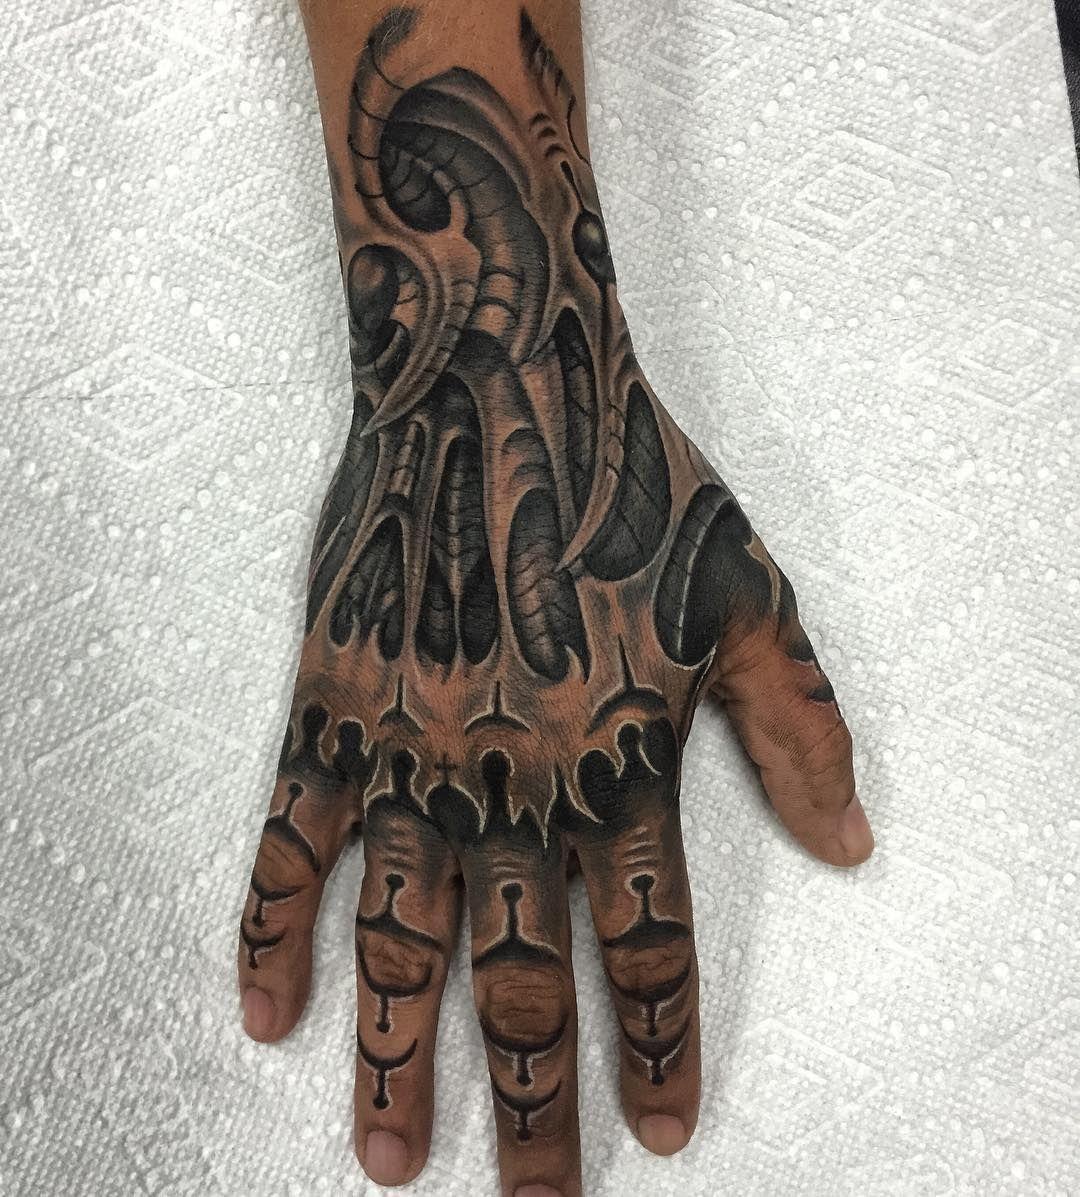 Biomechanical Tattoo 77 Biomechanical Tattoo Tattoo Design For Hand Biomechanical Tattoo Design